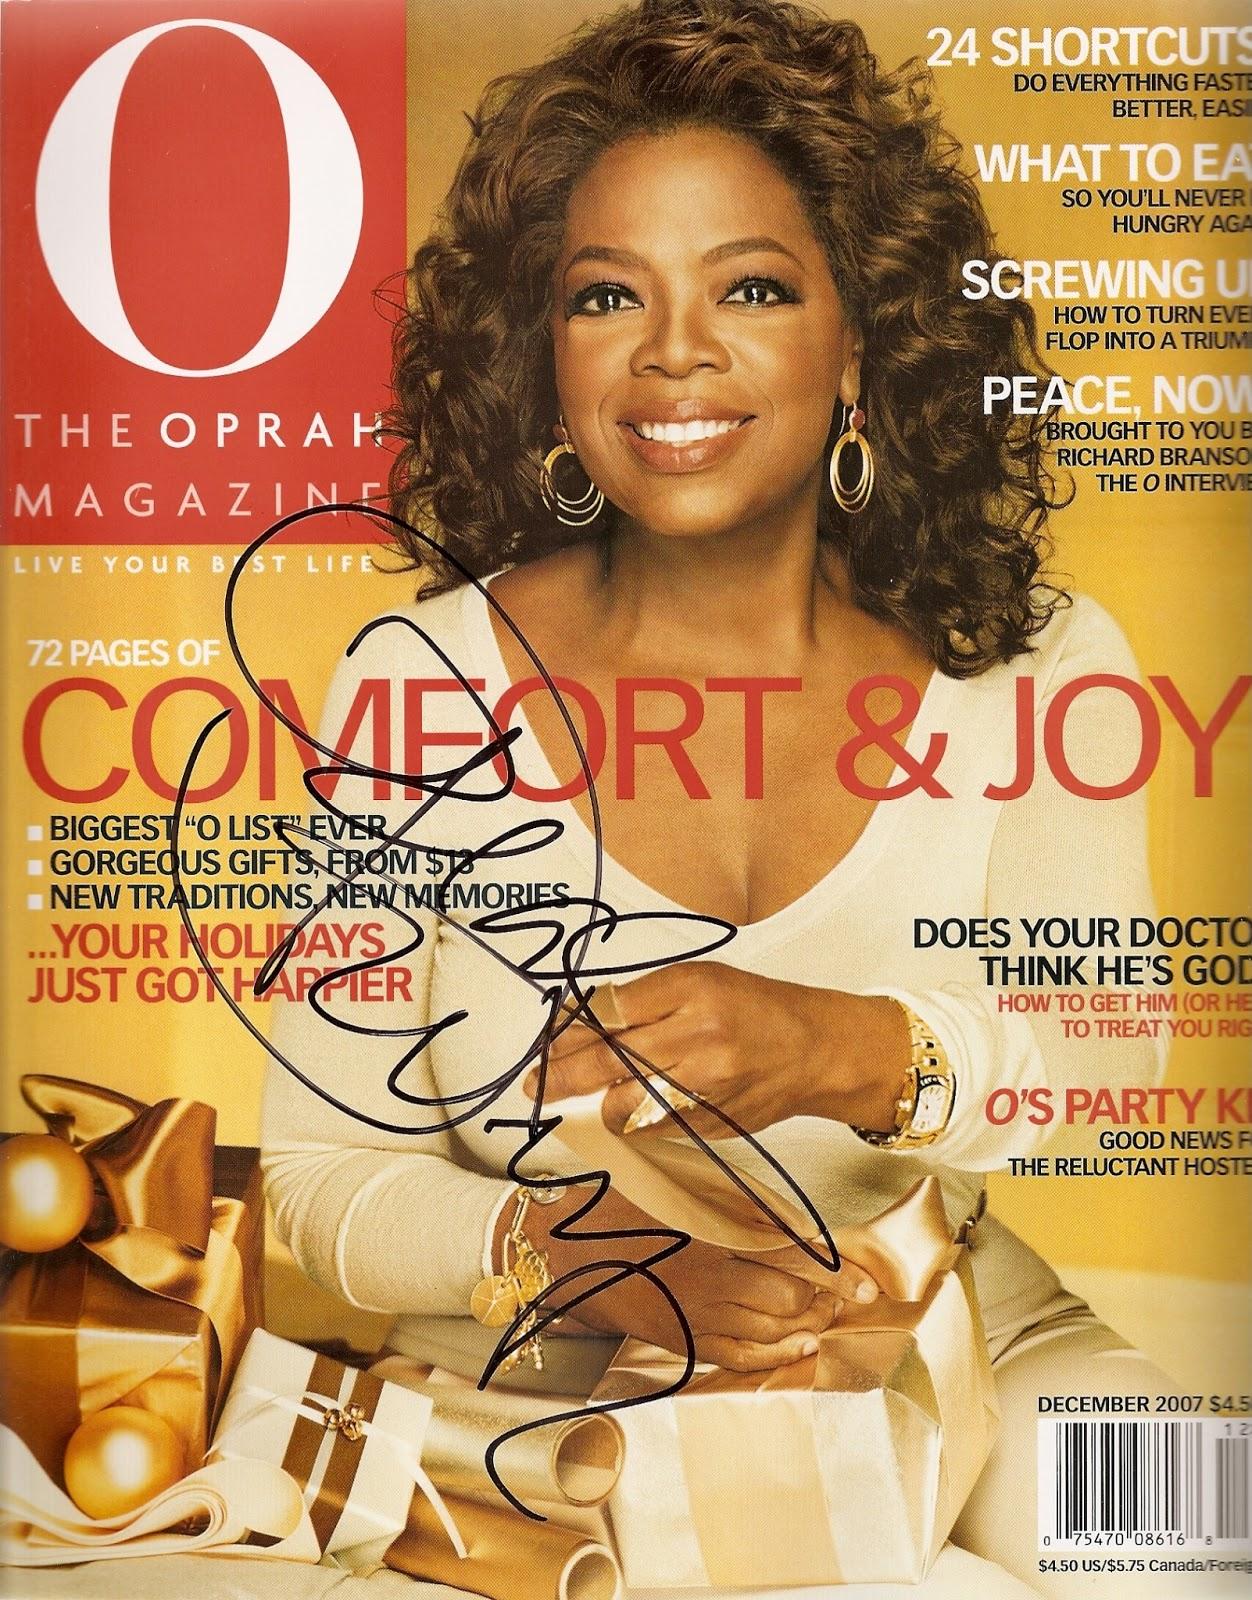 http://3.bp.blogspot.com/-6LZ9-0oXndg/UP5zmGzgC1I/AAAAAAAAI2Q/IyGB85Z9ICA/s1600/OprahWinfrey.jpg